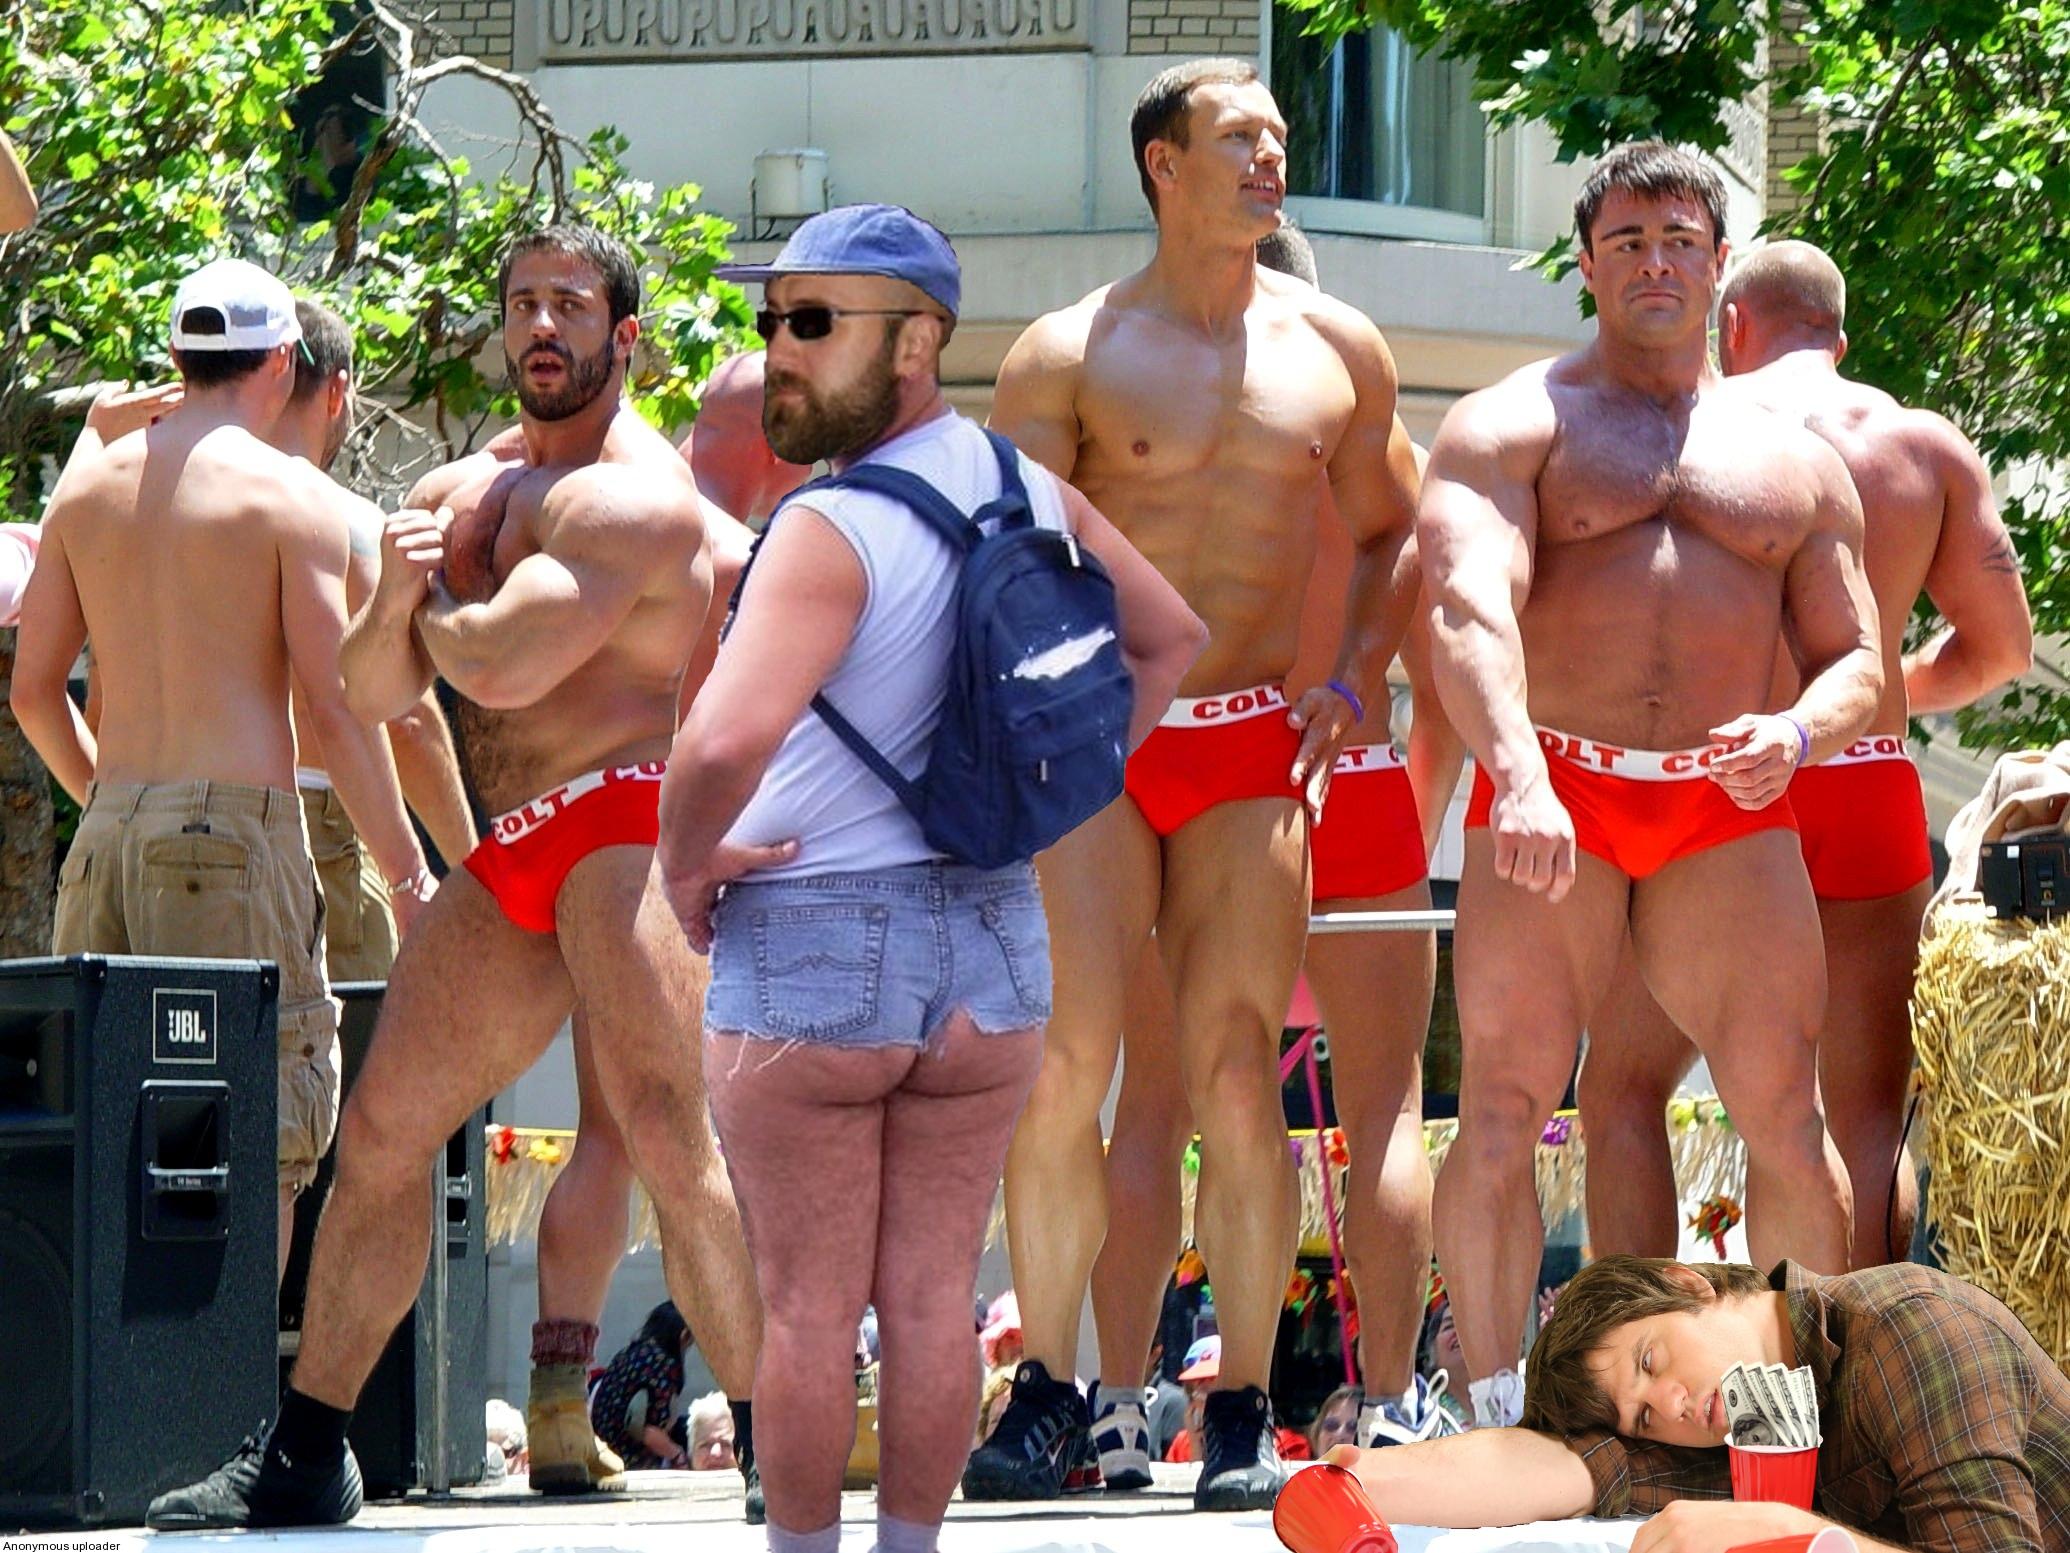 Gay goblin erotic pic